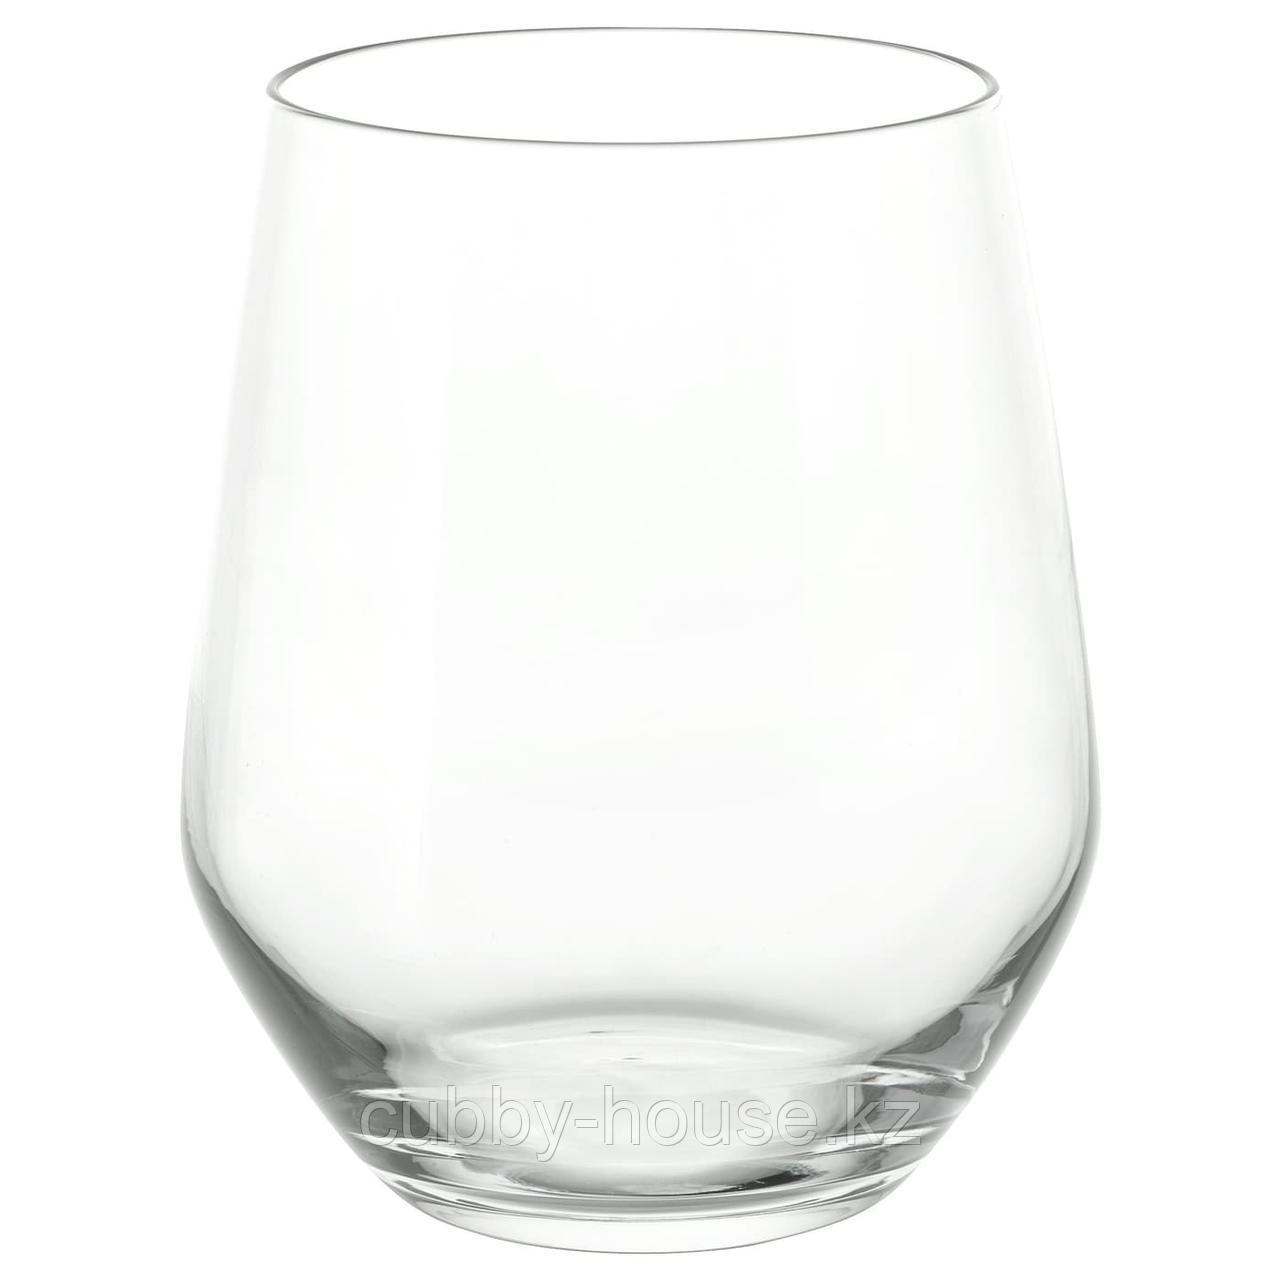 ИВРИГ Стакан, прозрачное стекло, 45 сл